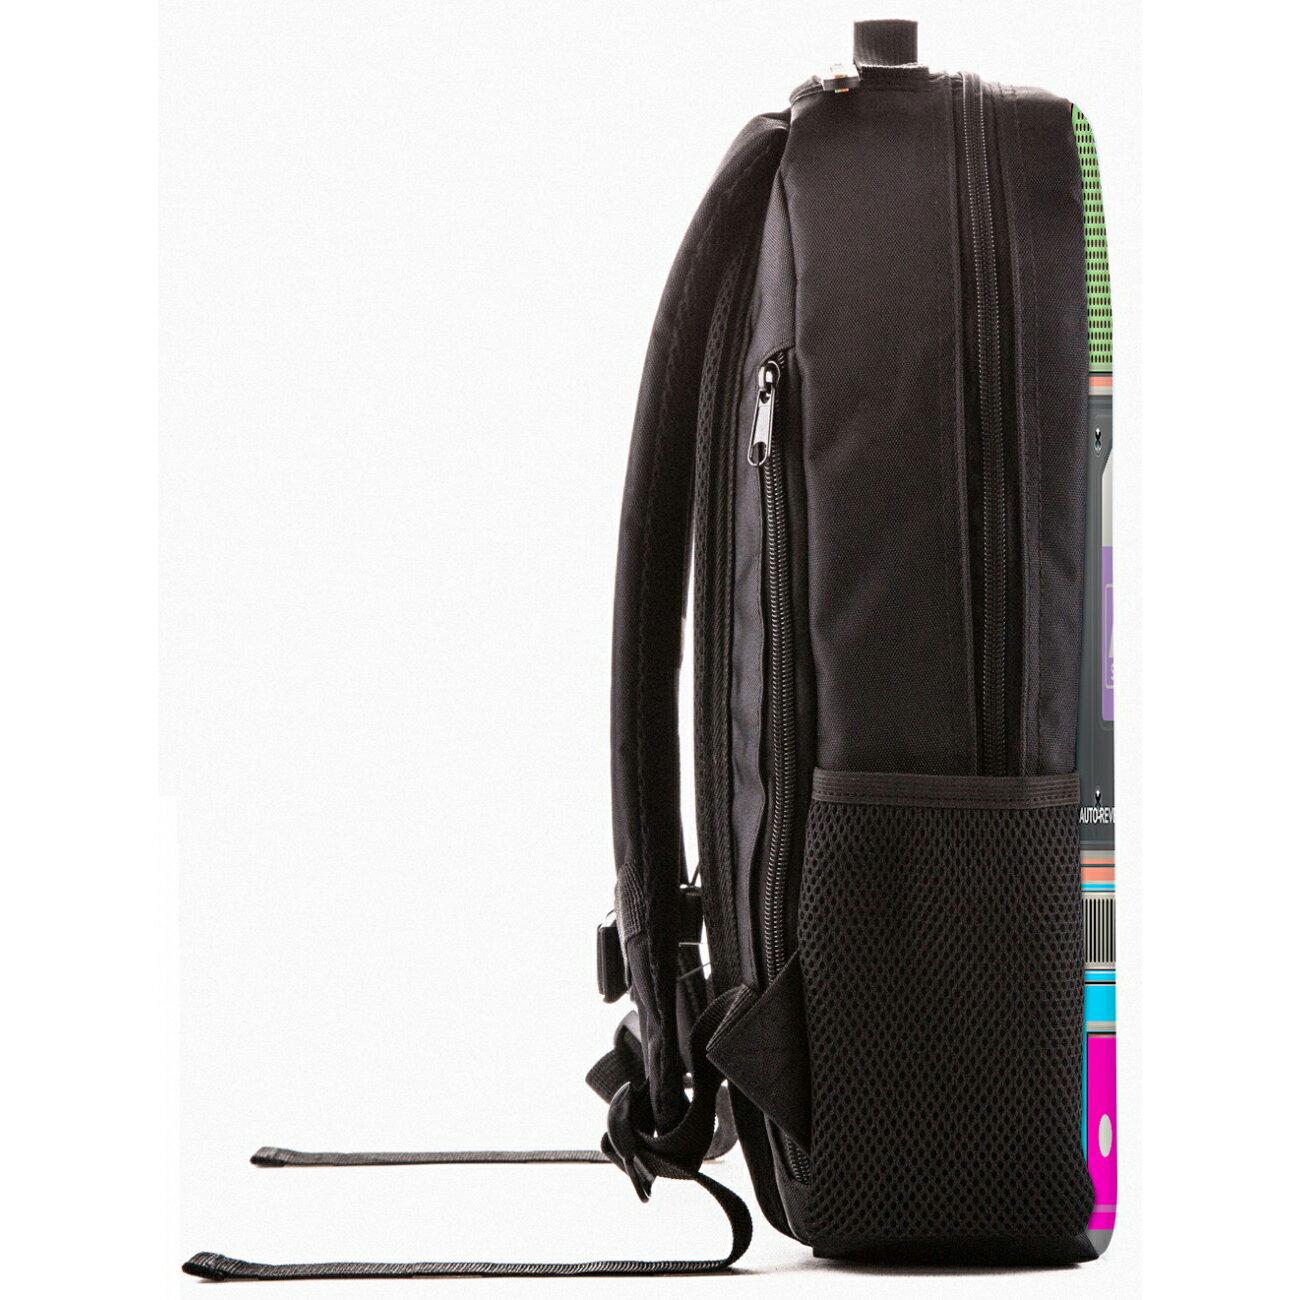 Urban Junk Rewind Backpack 1